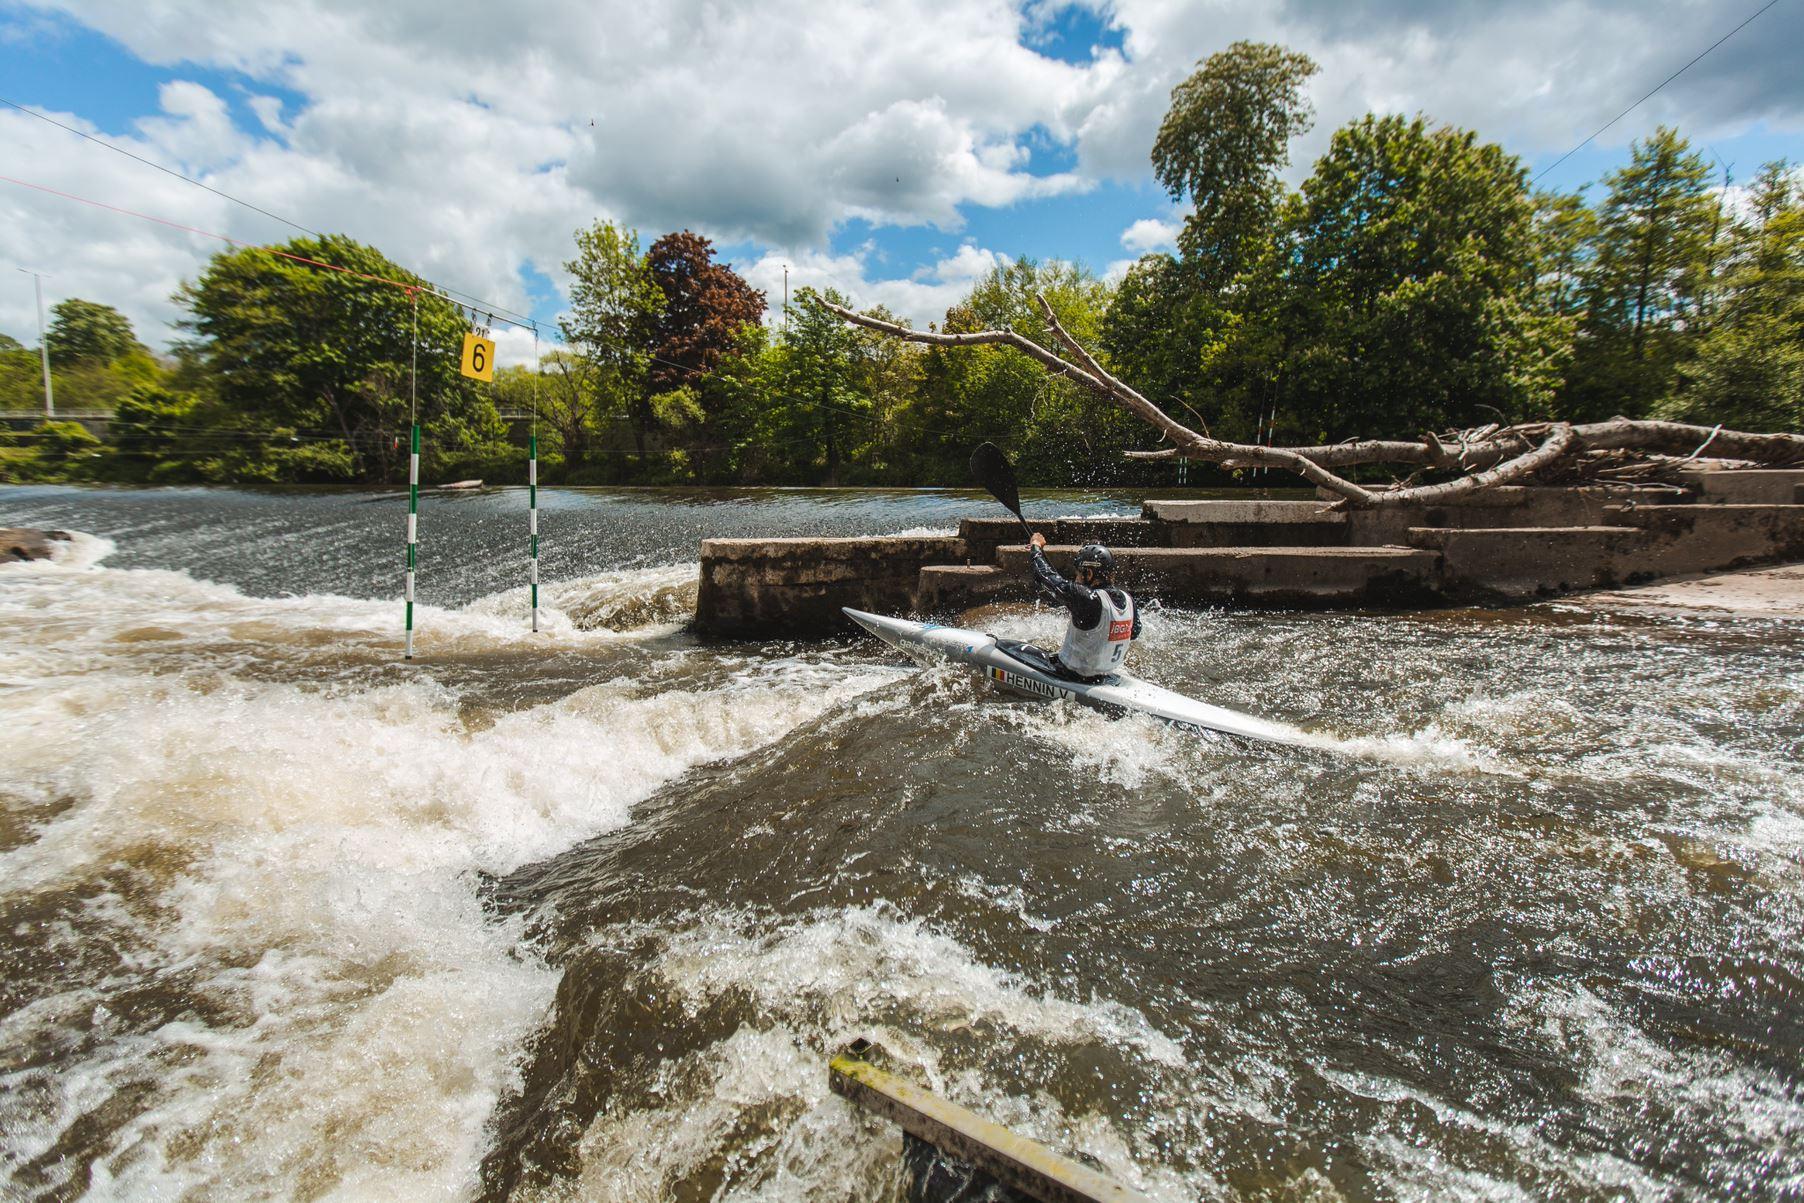 ffc-kayak-competition-slalom